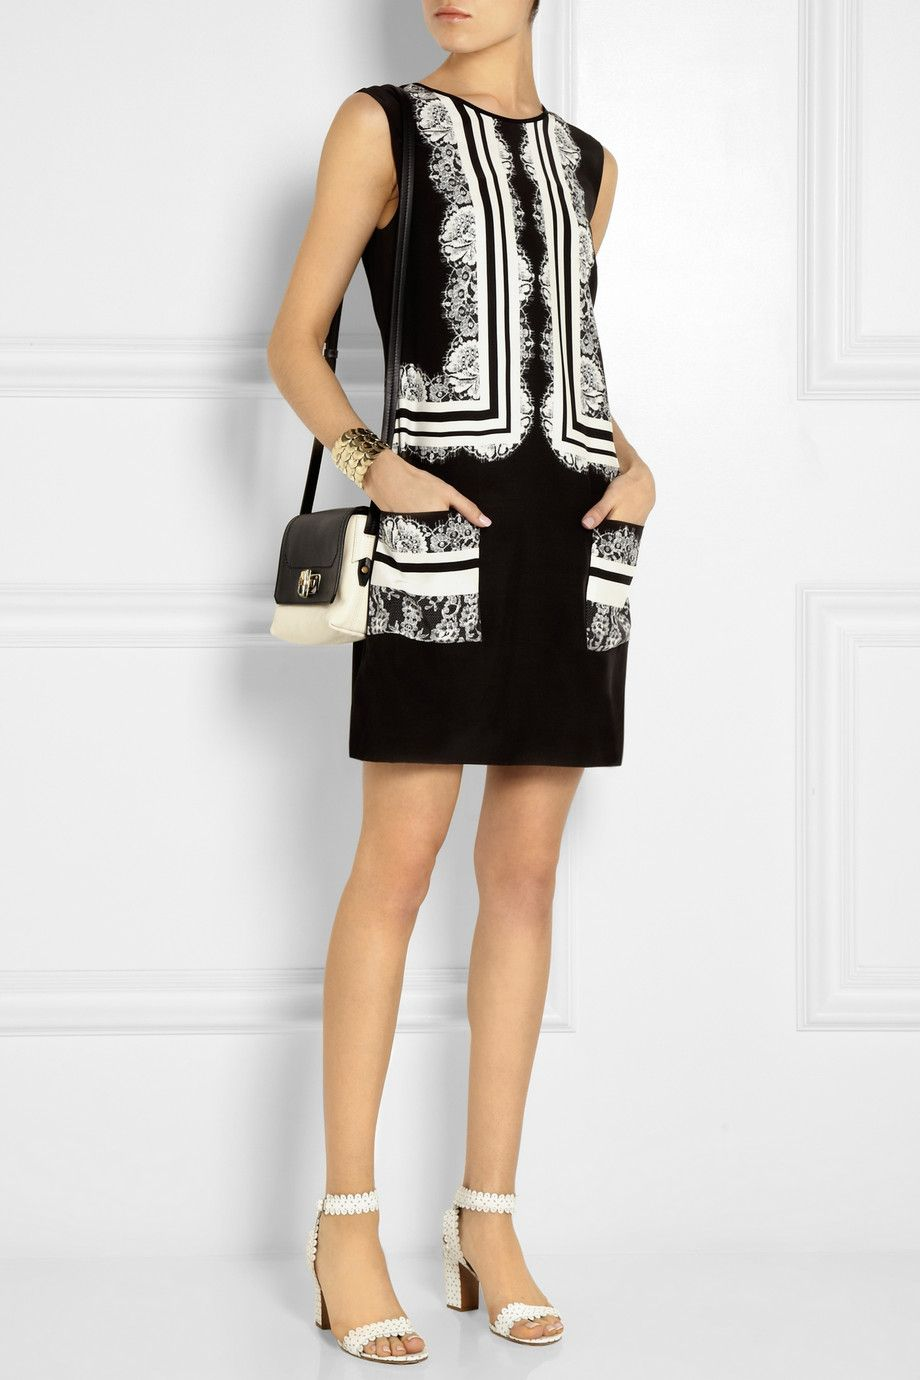 Erdem|Frula printed silk dress|NET-A-PORTER.COM